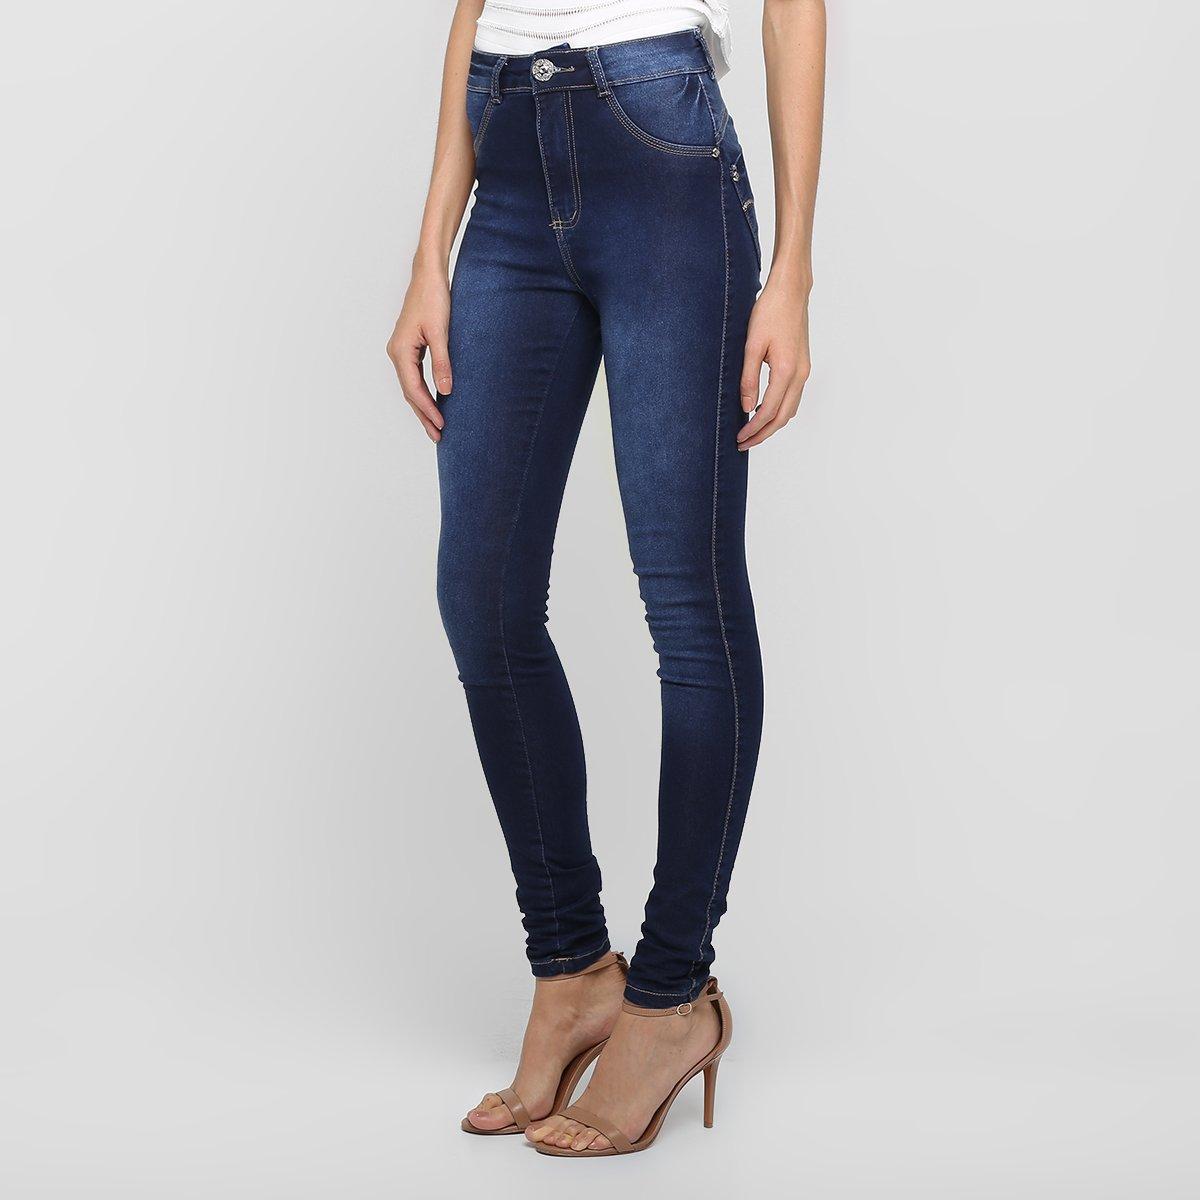 Calça Jeans Biotipo Hot Pants